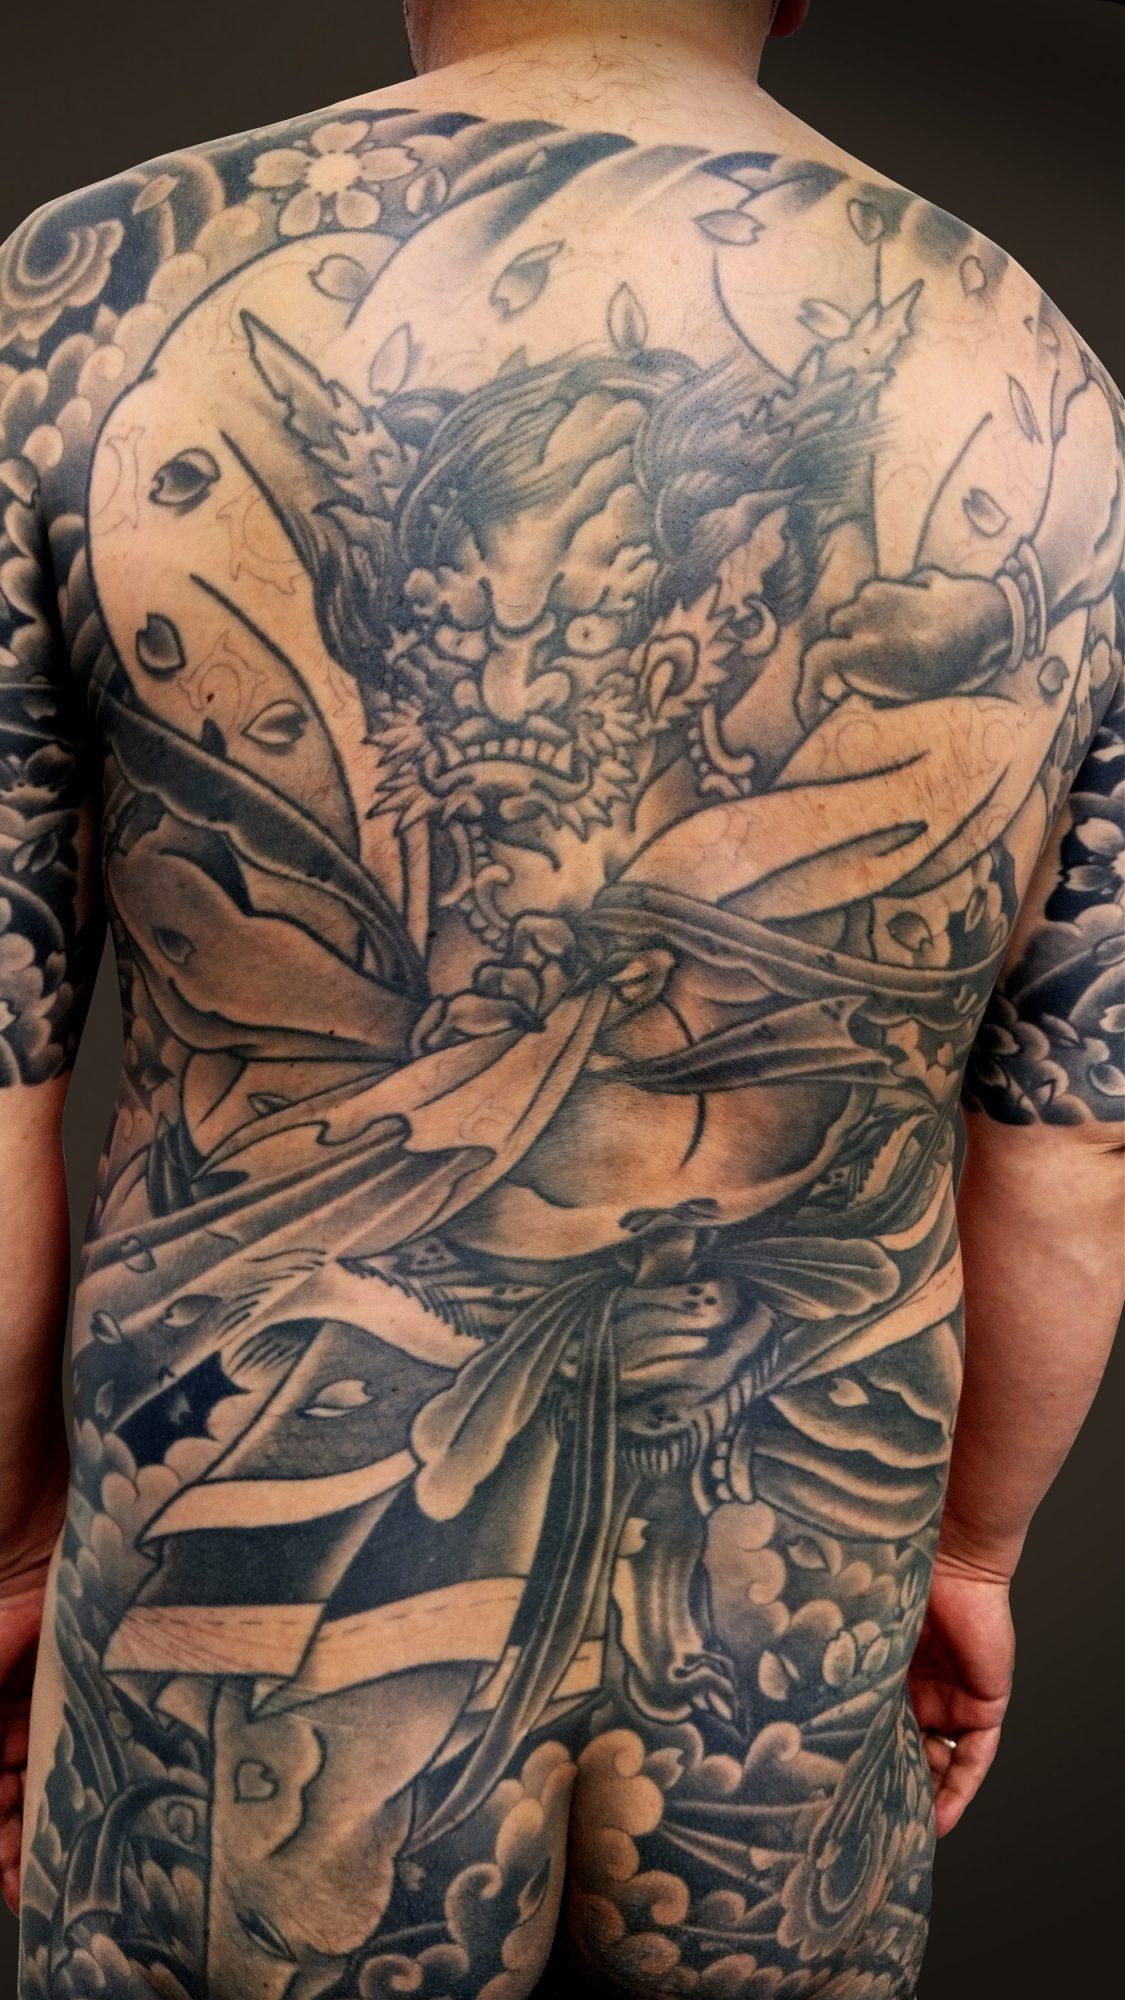 KINGRAT TATTOO 作品 | LAVA gallery | Tattoo artist: Yuji Anai | キングラット | ラバギャラリー | タトゥーアート | 福岡県北九州市 | 20210718_04b